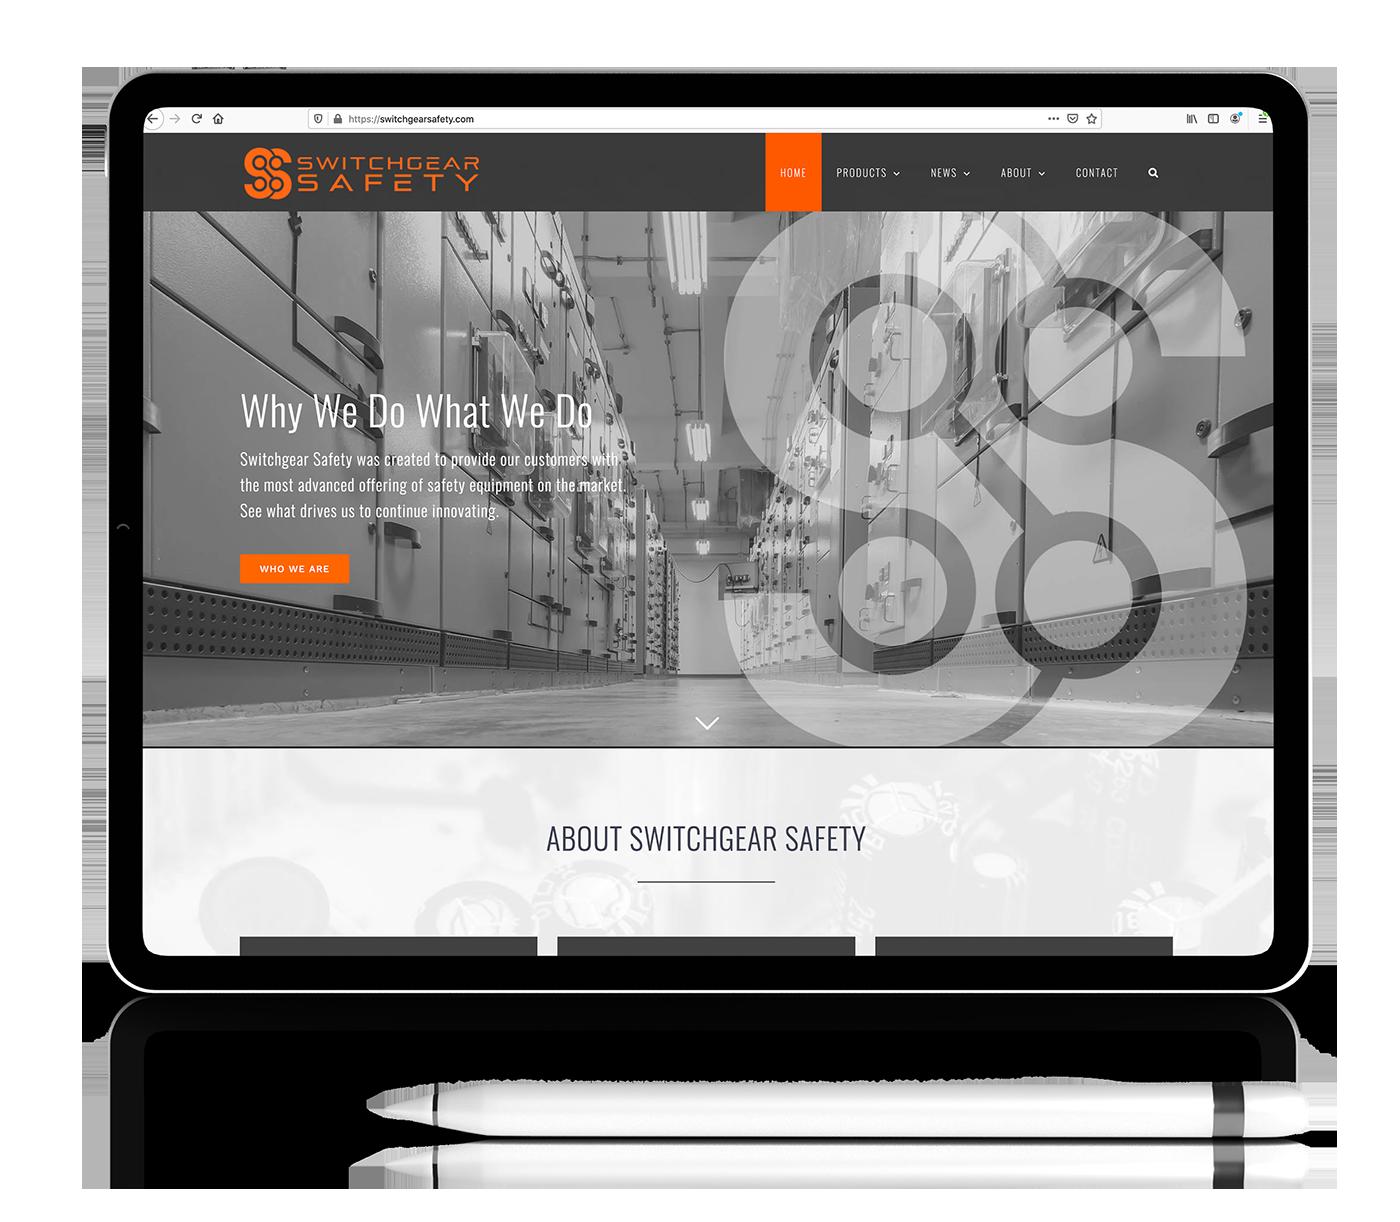 iPad-pro website design mockup